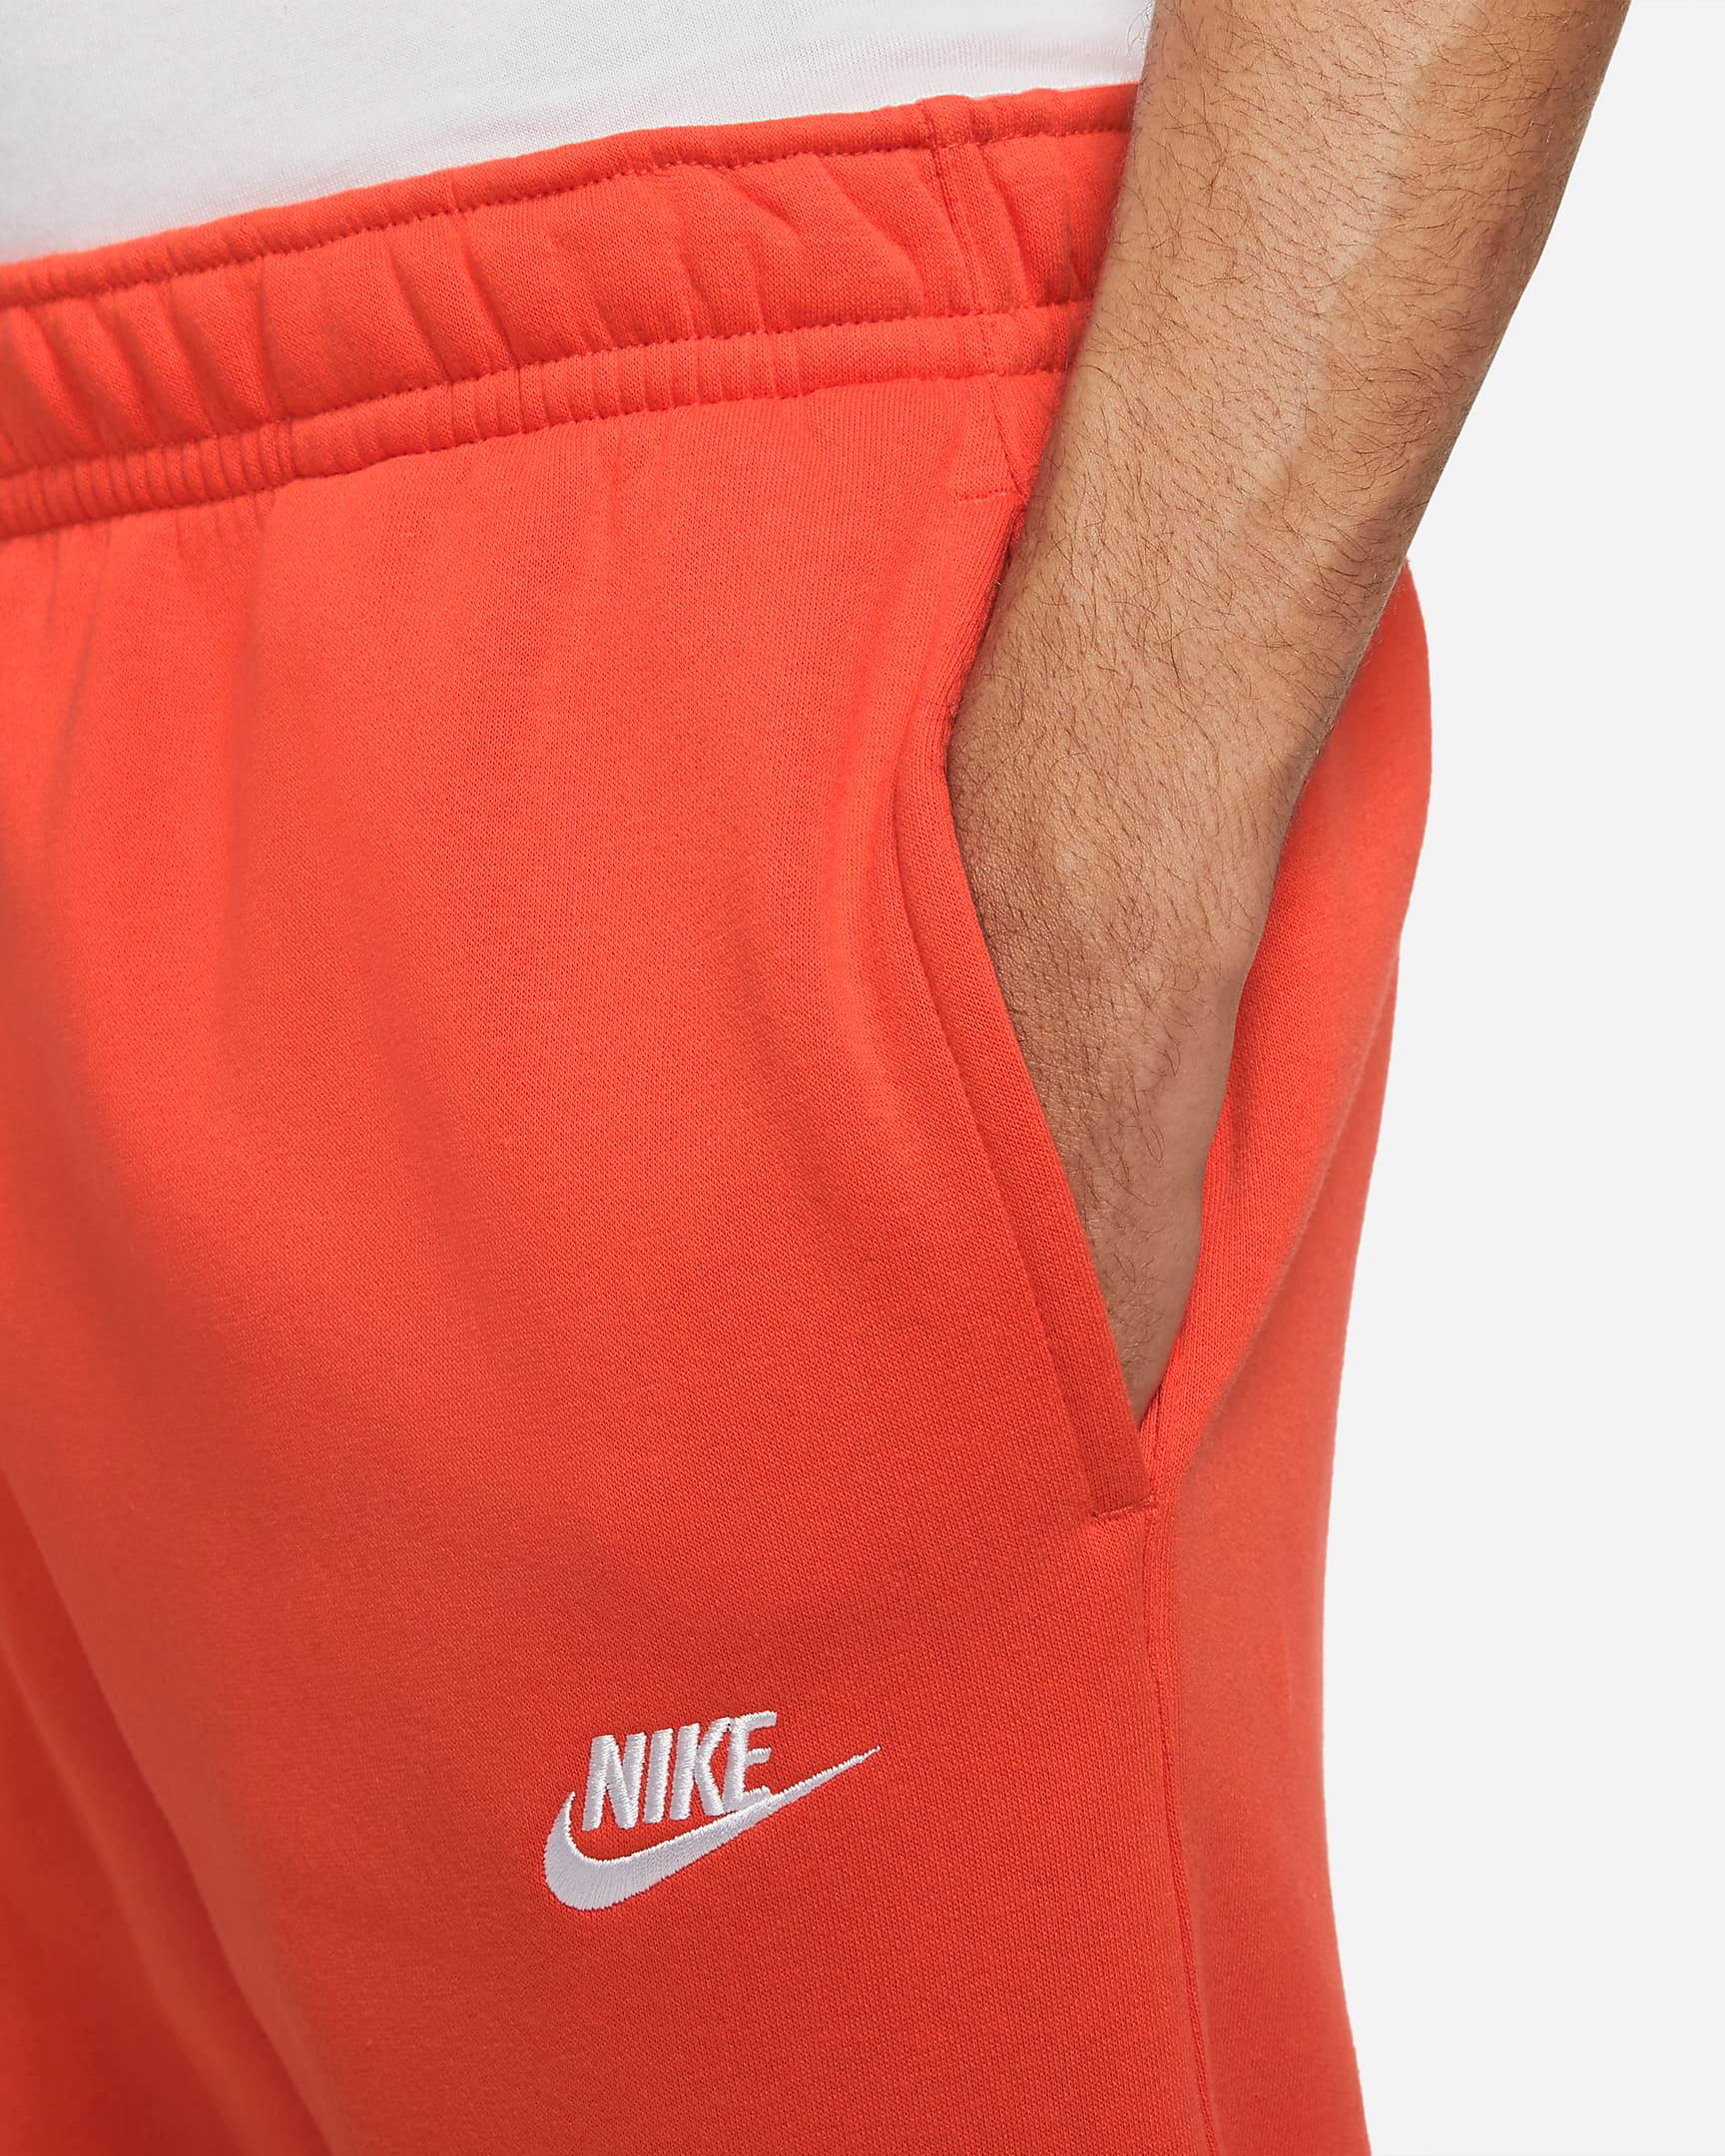 nike club fleece orange jogger pants 2